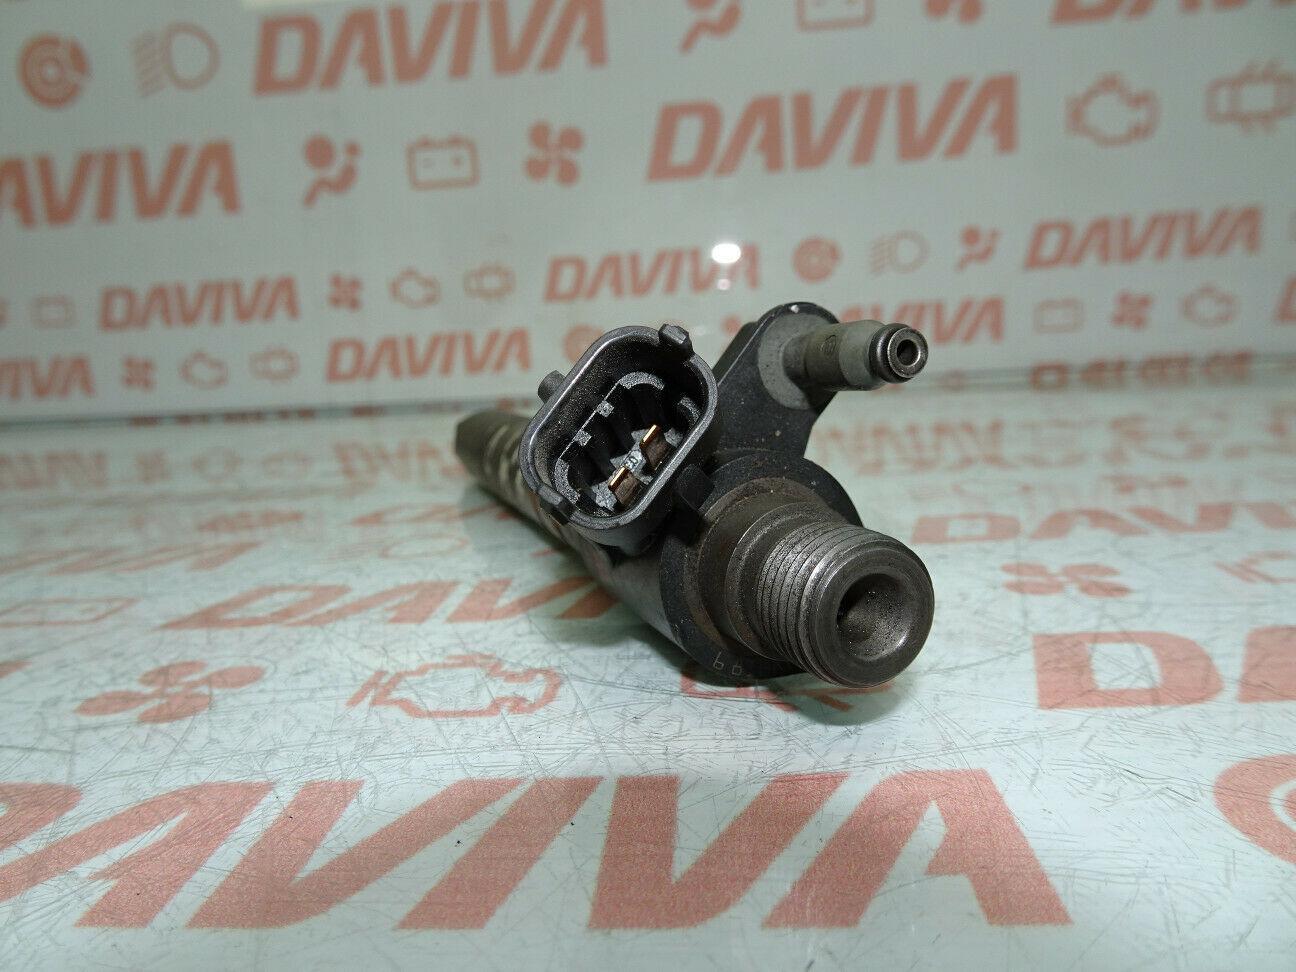 VOLVO V70 XC70 S60 S80 XC60 2.4 DIESEL D5 ENGINE BOSCH FUEL INJECTOR 0445116016